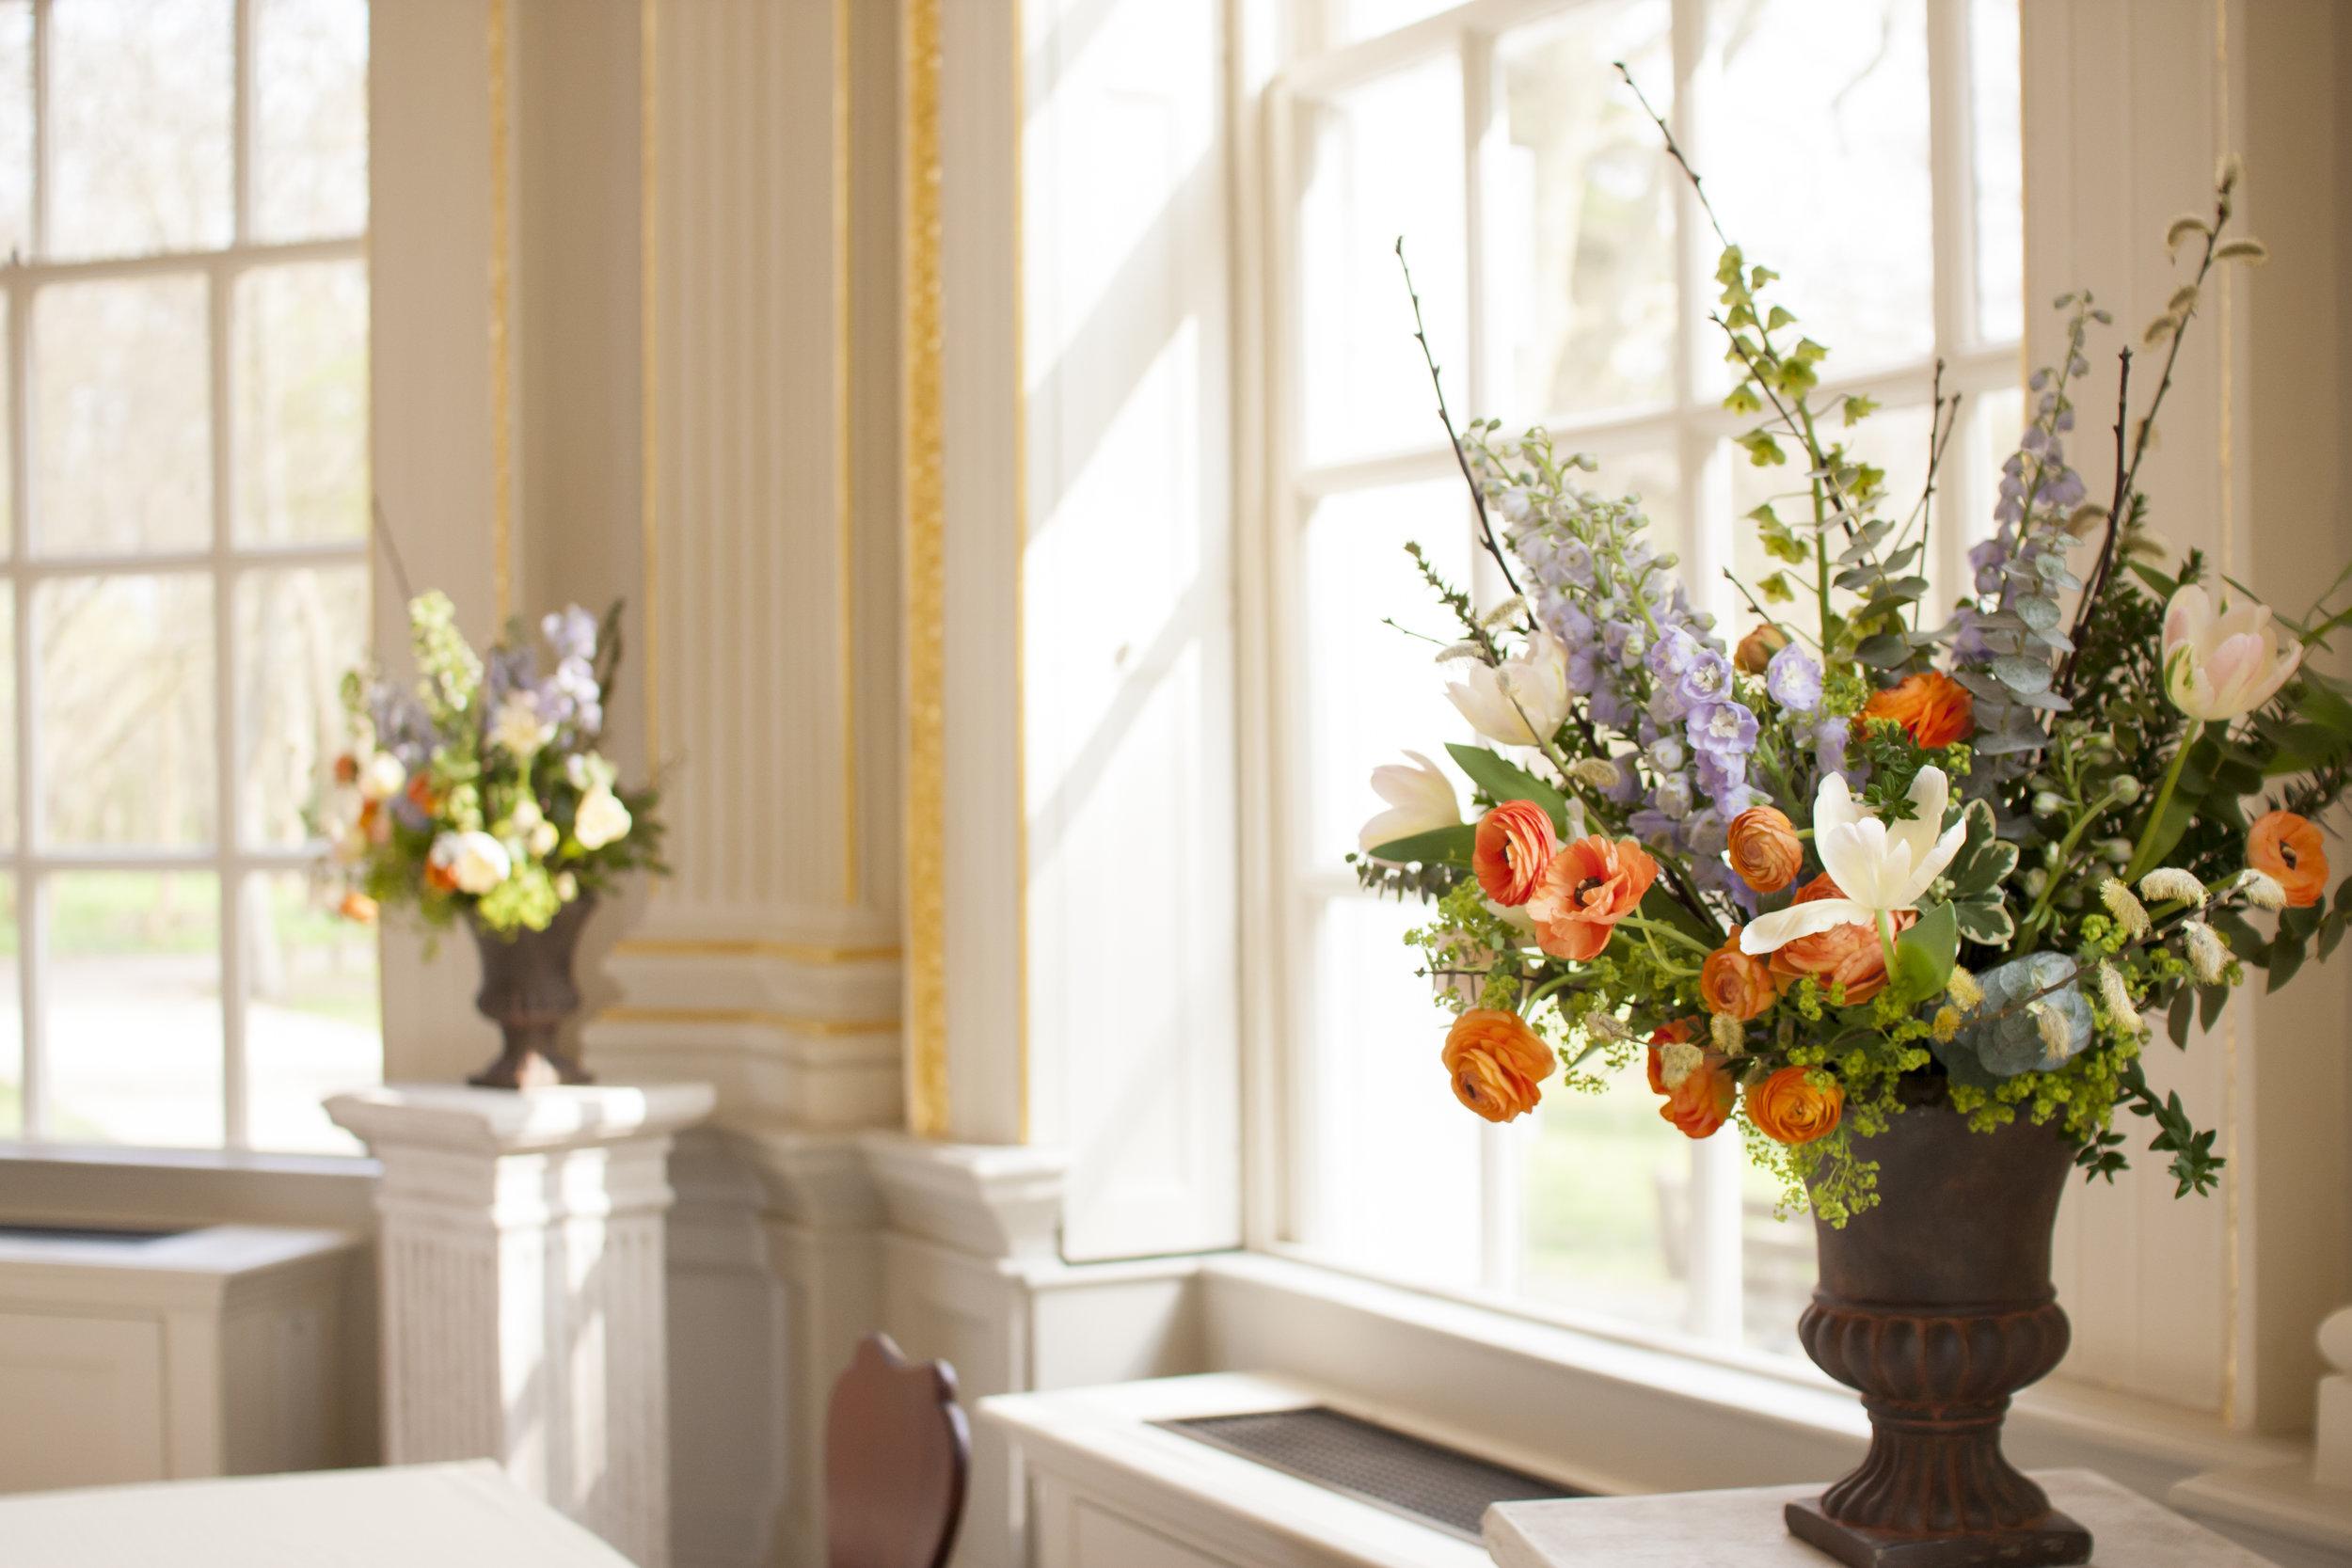 Orleans_House_Twickenham_Wedding_flowers.5.jpg